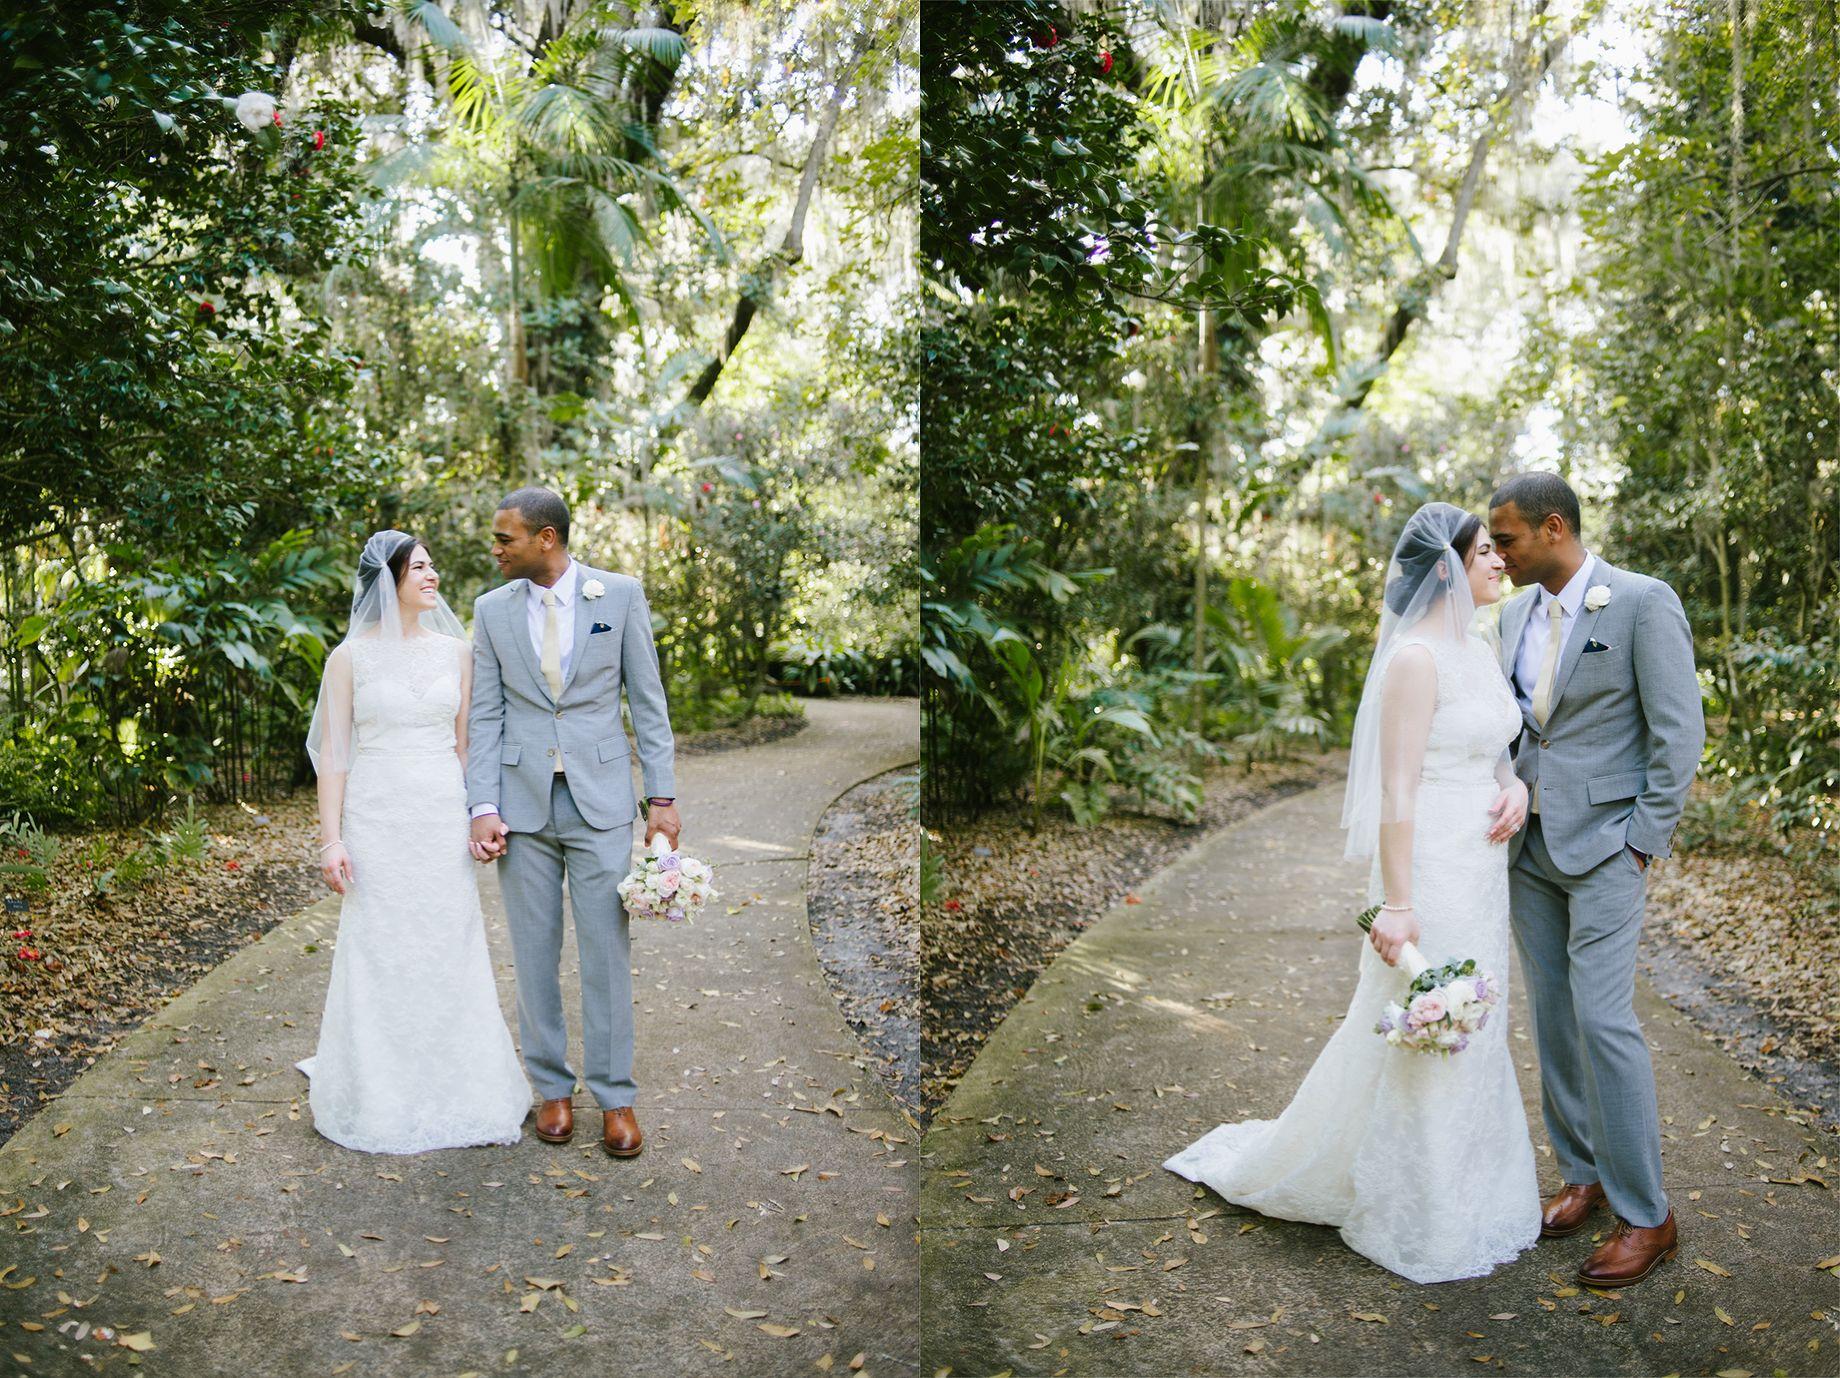 leu garden manny u0026 natasha vintage look wedding venues